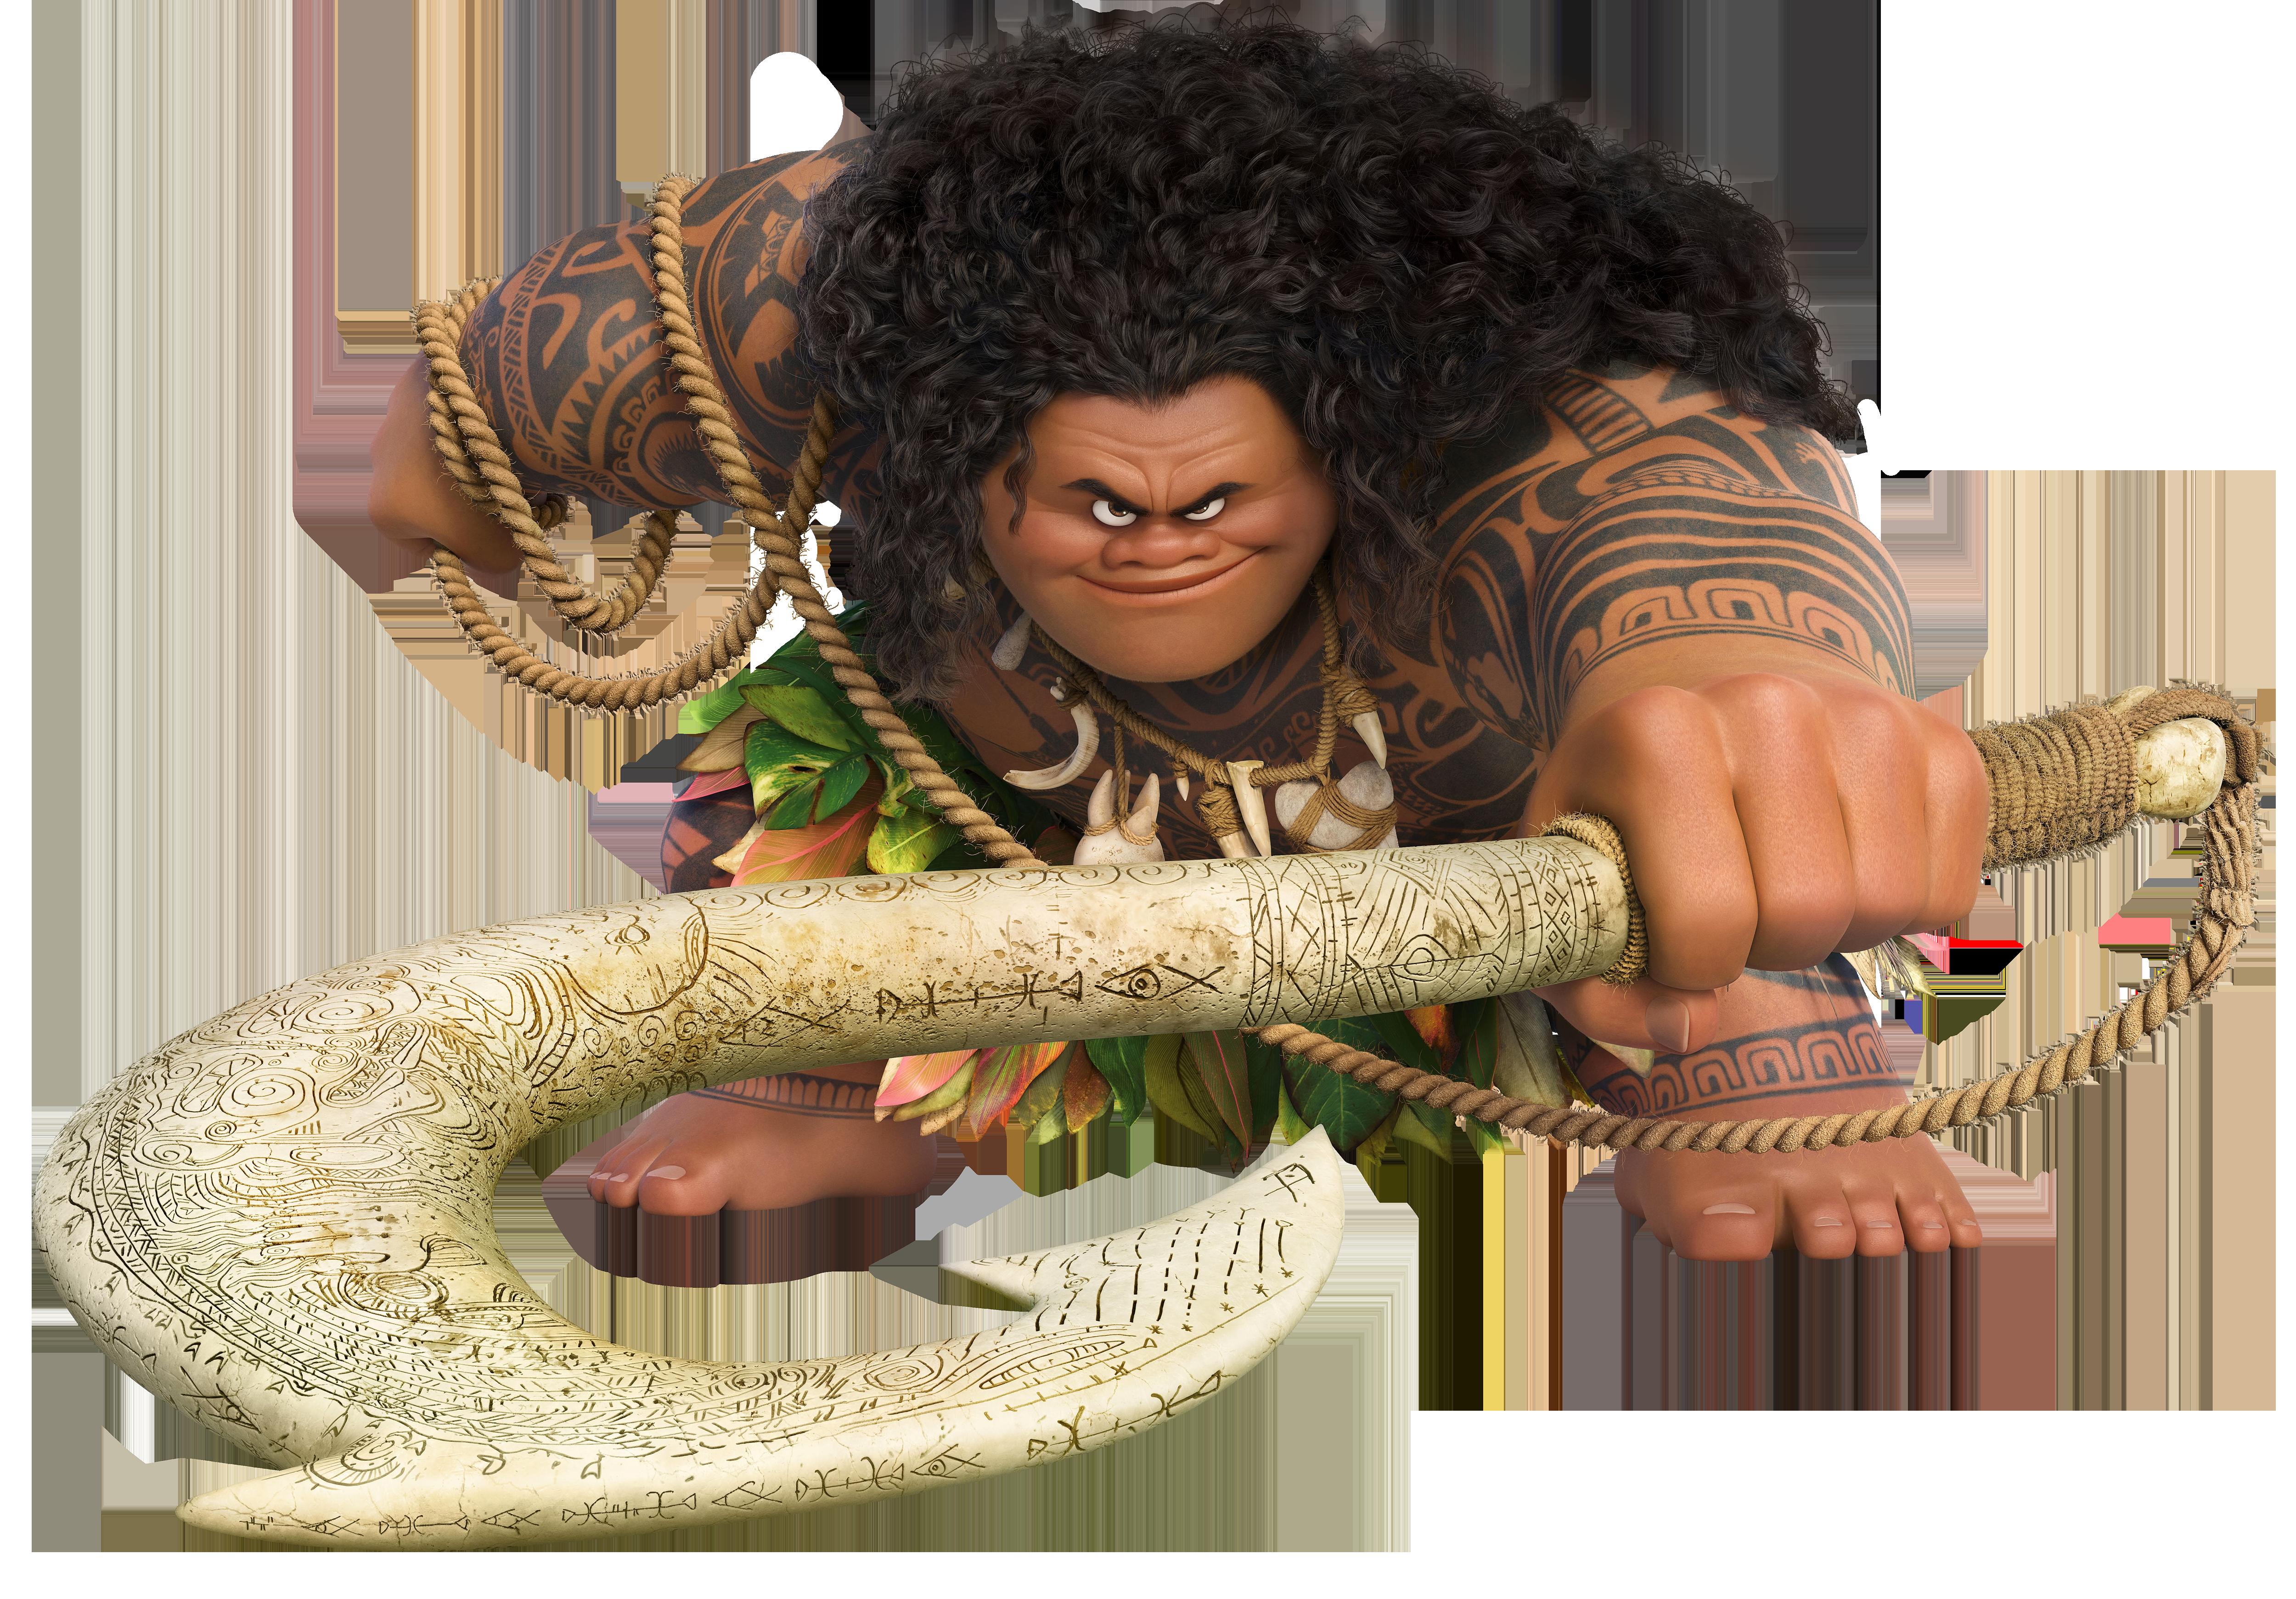 Maui Moana Disney Large Transparent PNG Image.